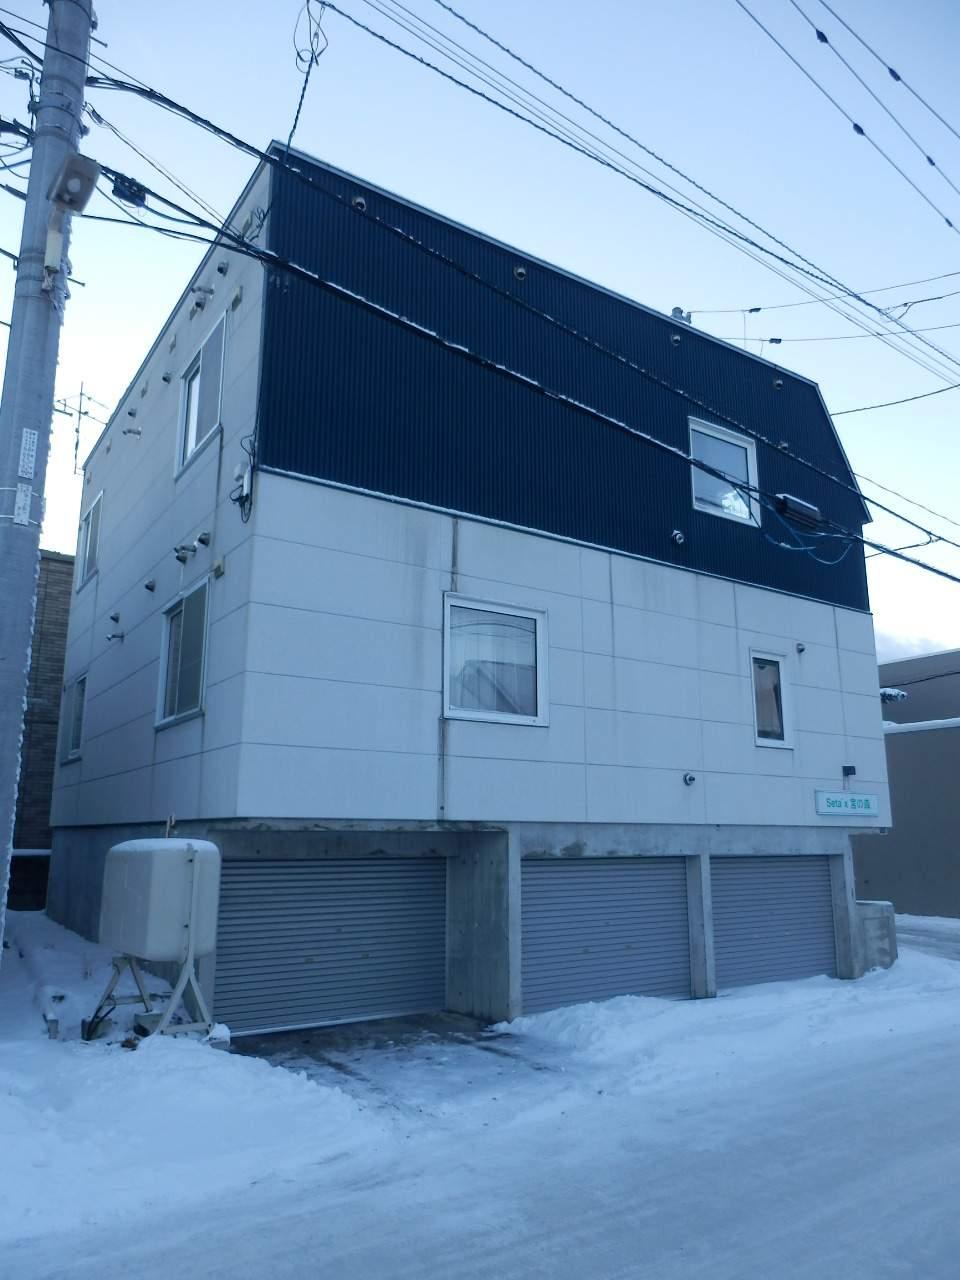 北海道札幌市中央区、西28丁目駅徒歩11分の築18年 3階建の賃貸アパート